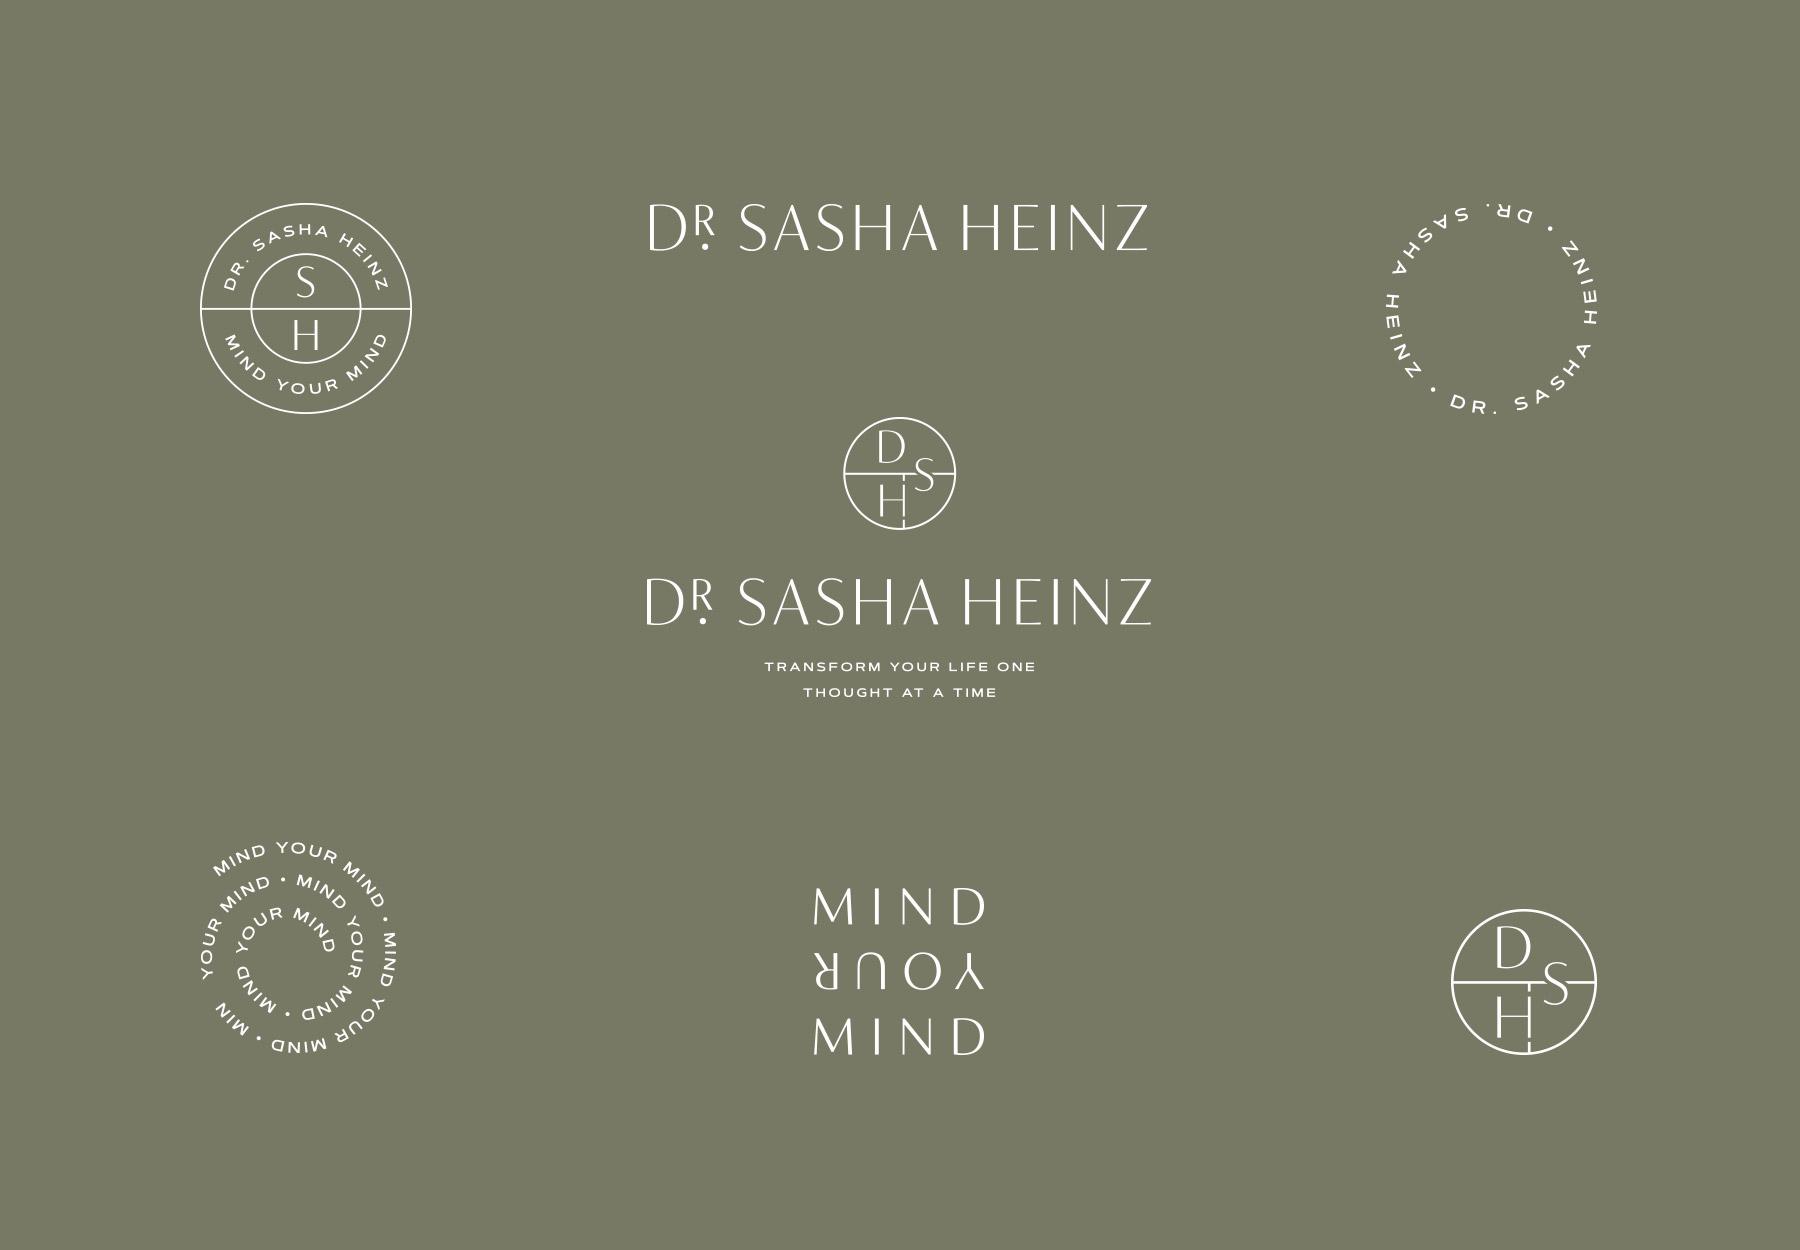 WE ARE BRANCH | DR. SASHA HEINZ BRAND